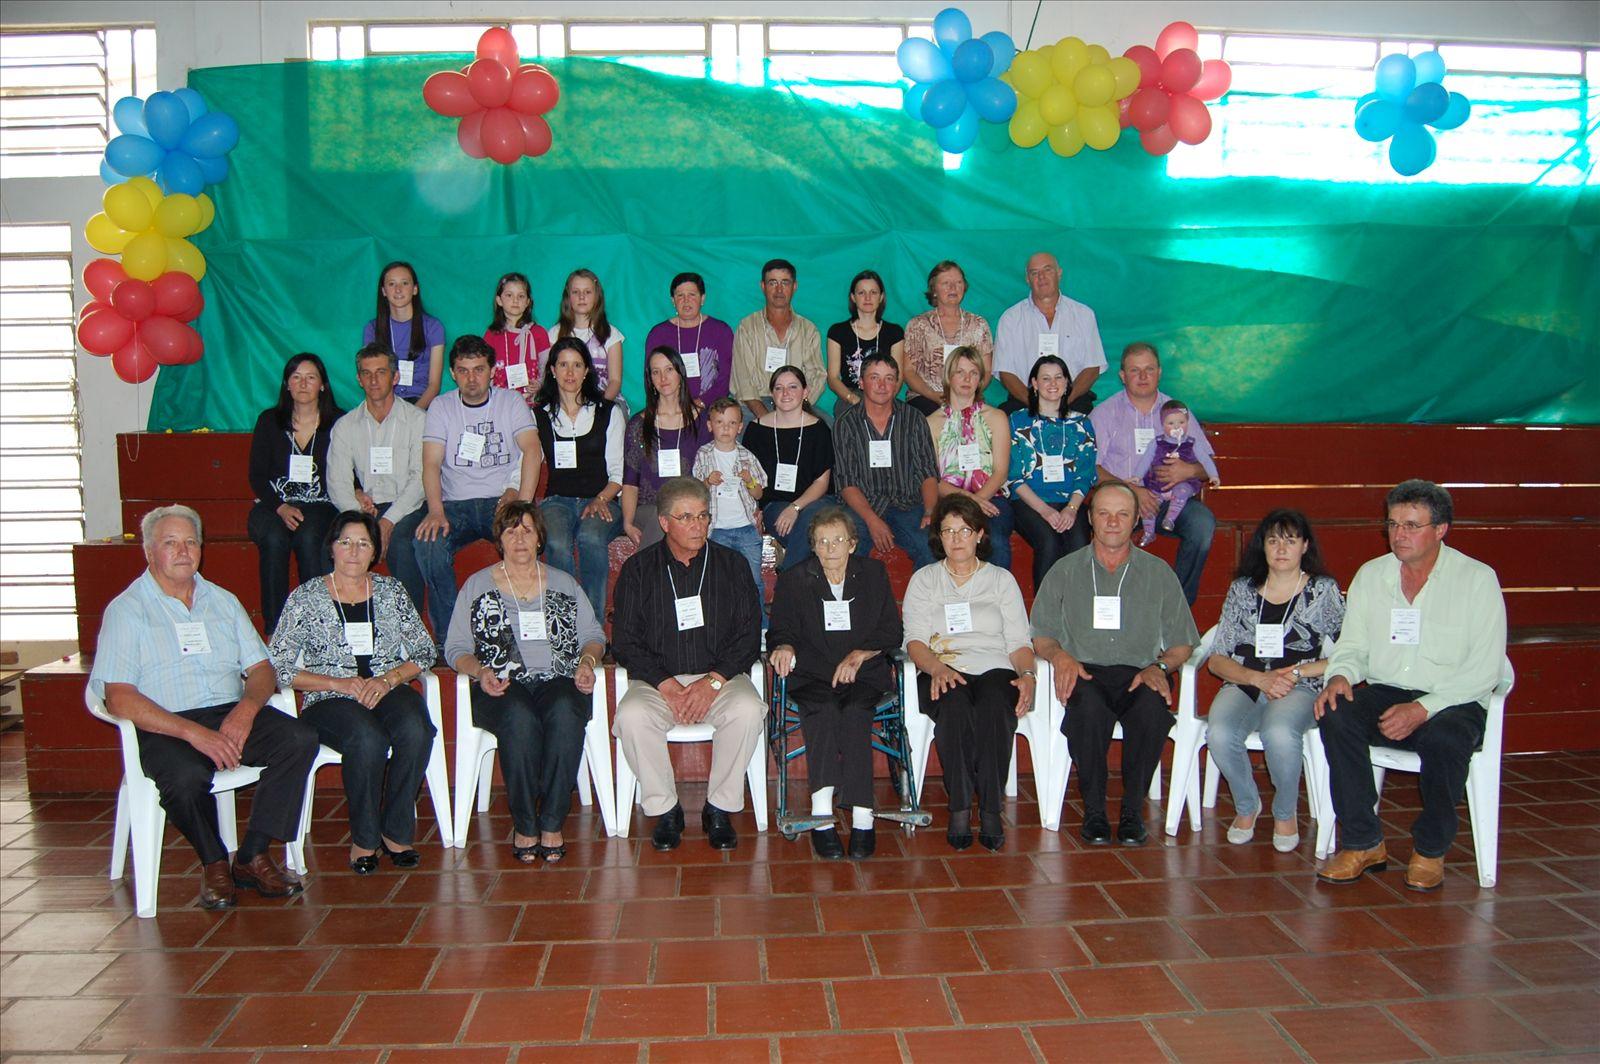 2º Encontro Família Cornelli - 11.10.2009 (173)_0